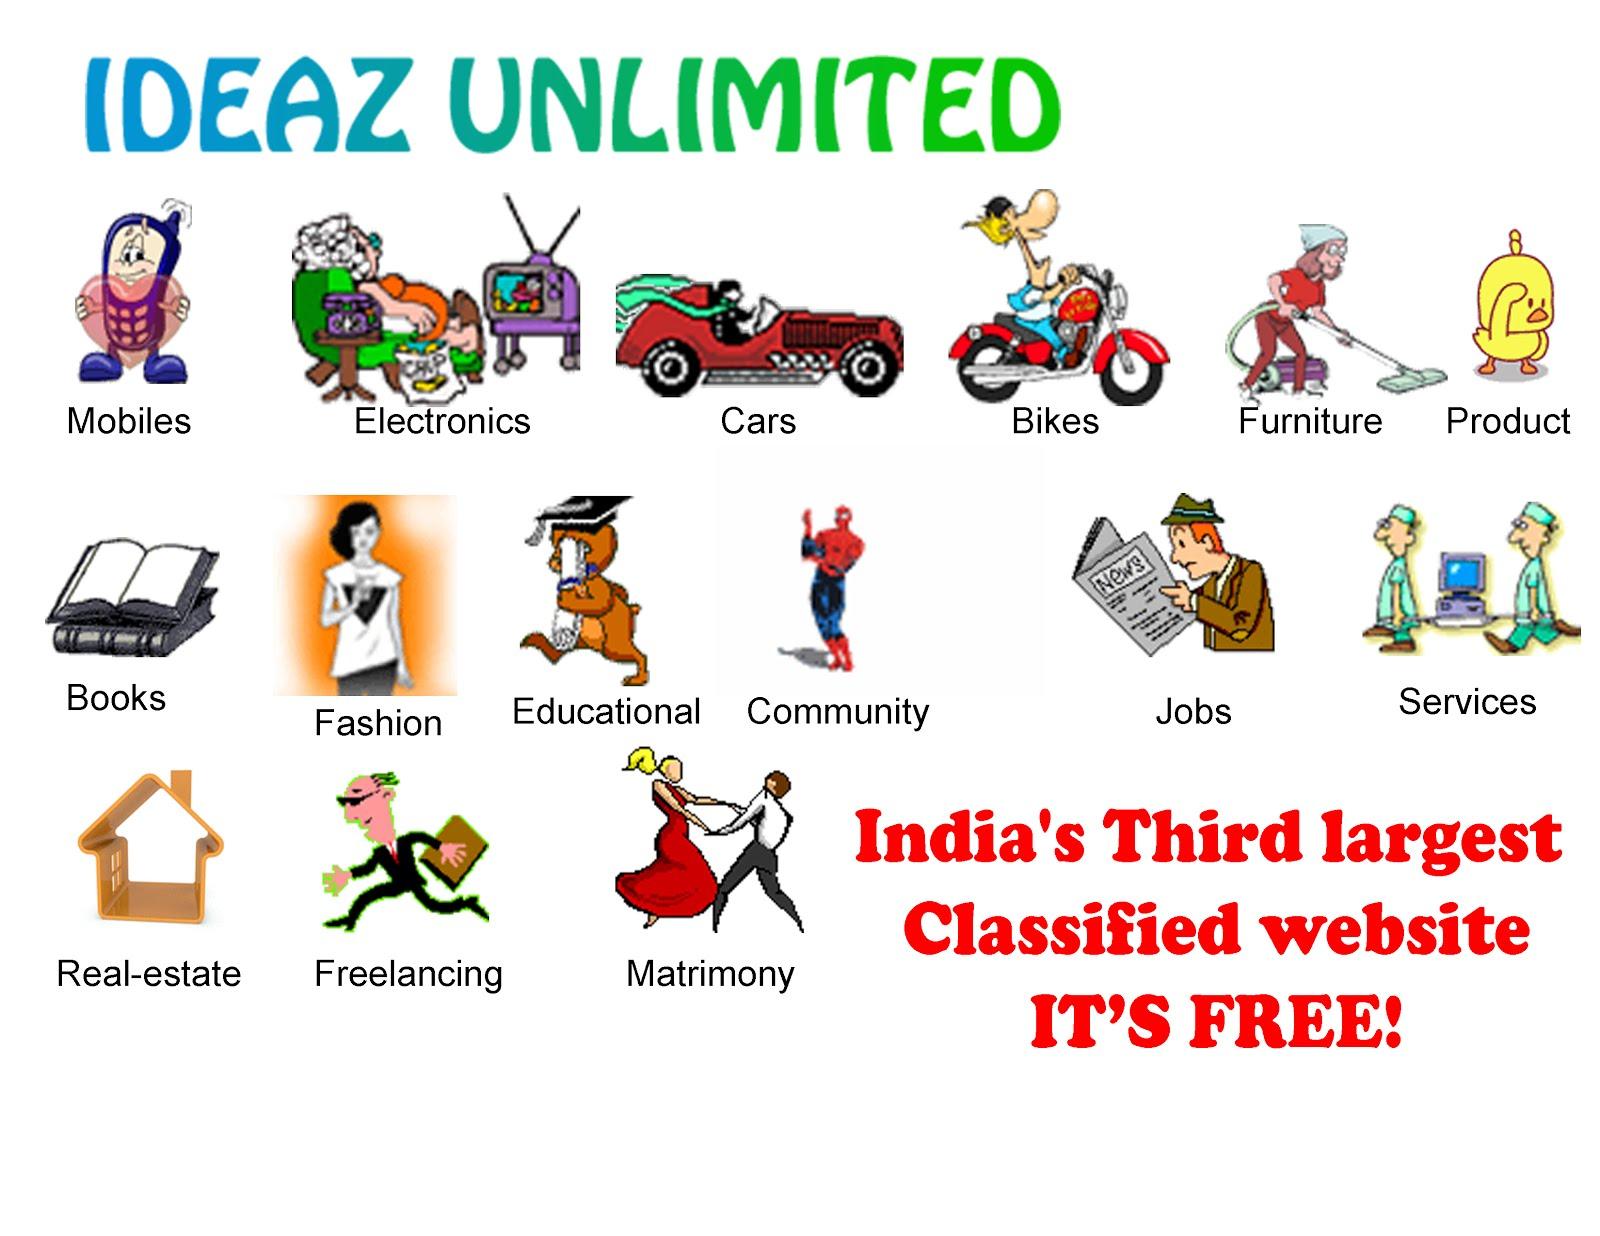 Ideaz unlimited Who is Parle G Girl & Murphy Radio Boy & Baby Guddu